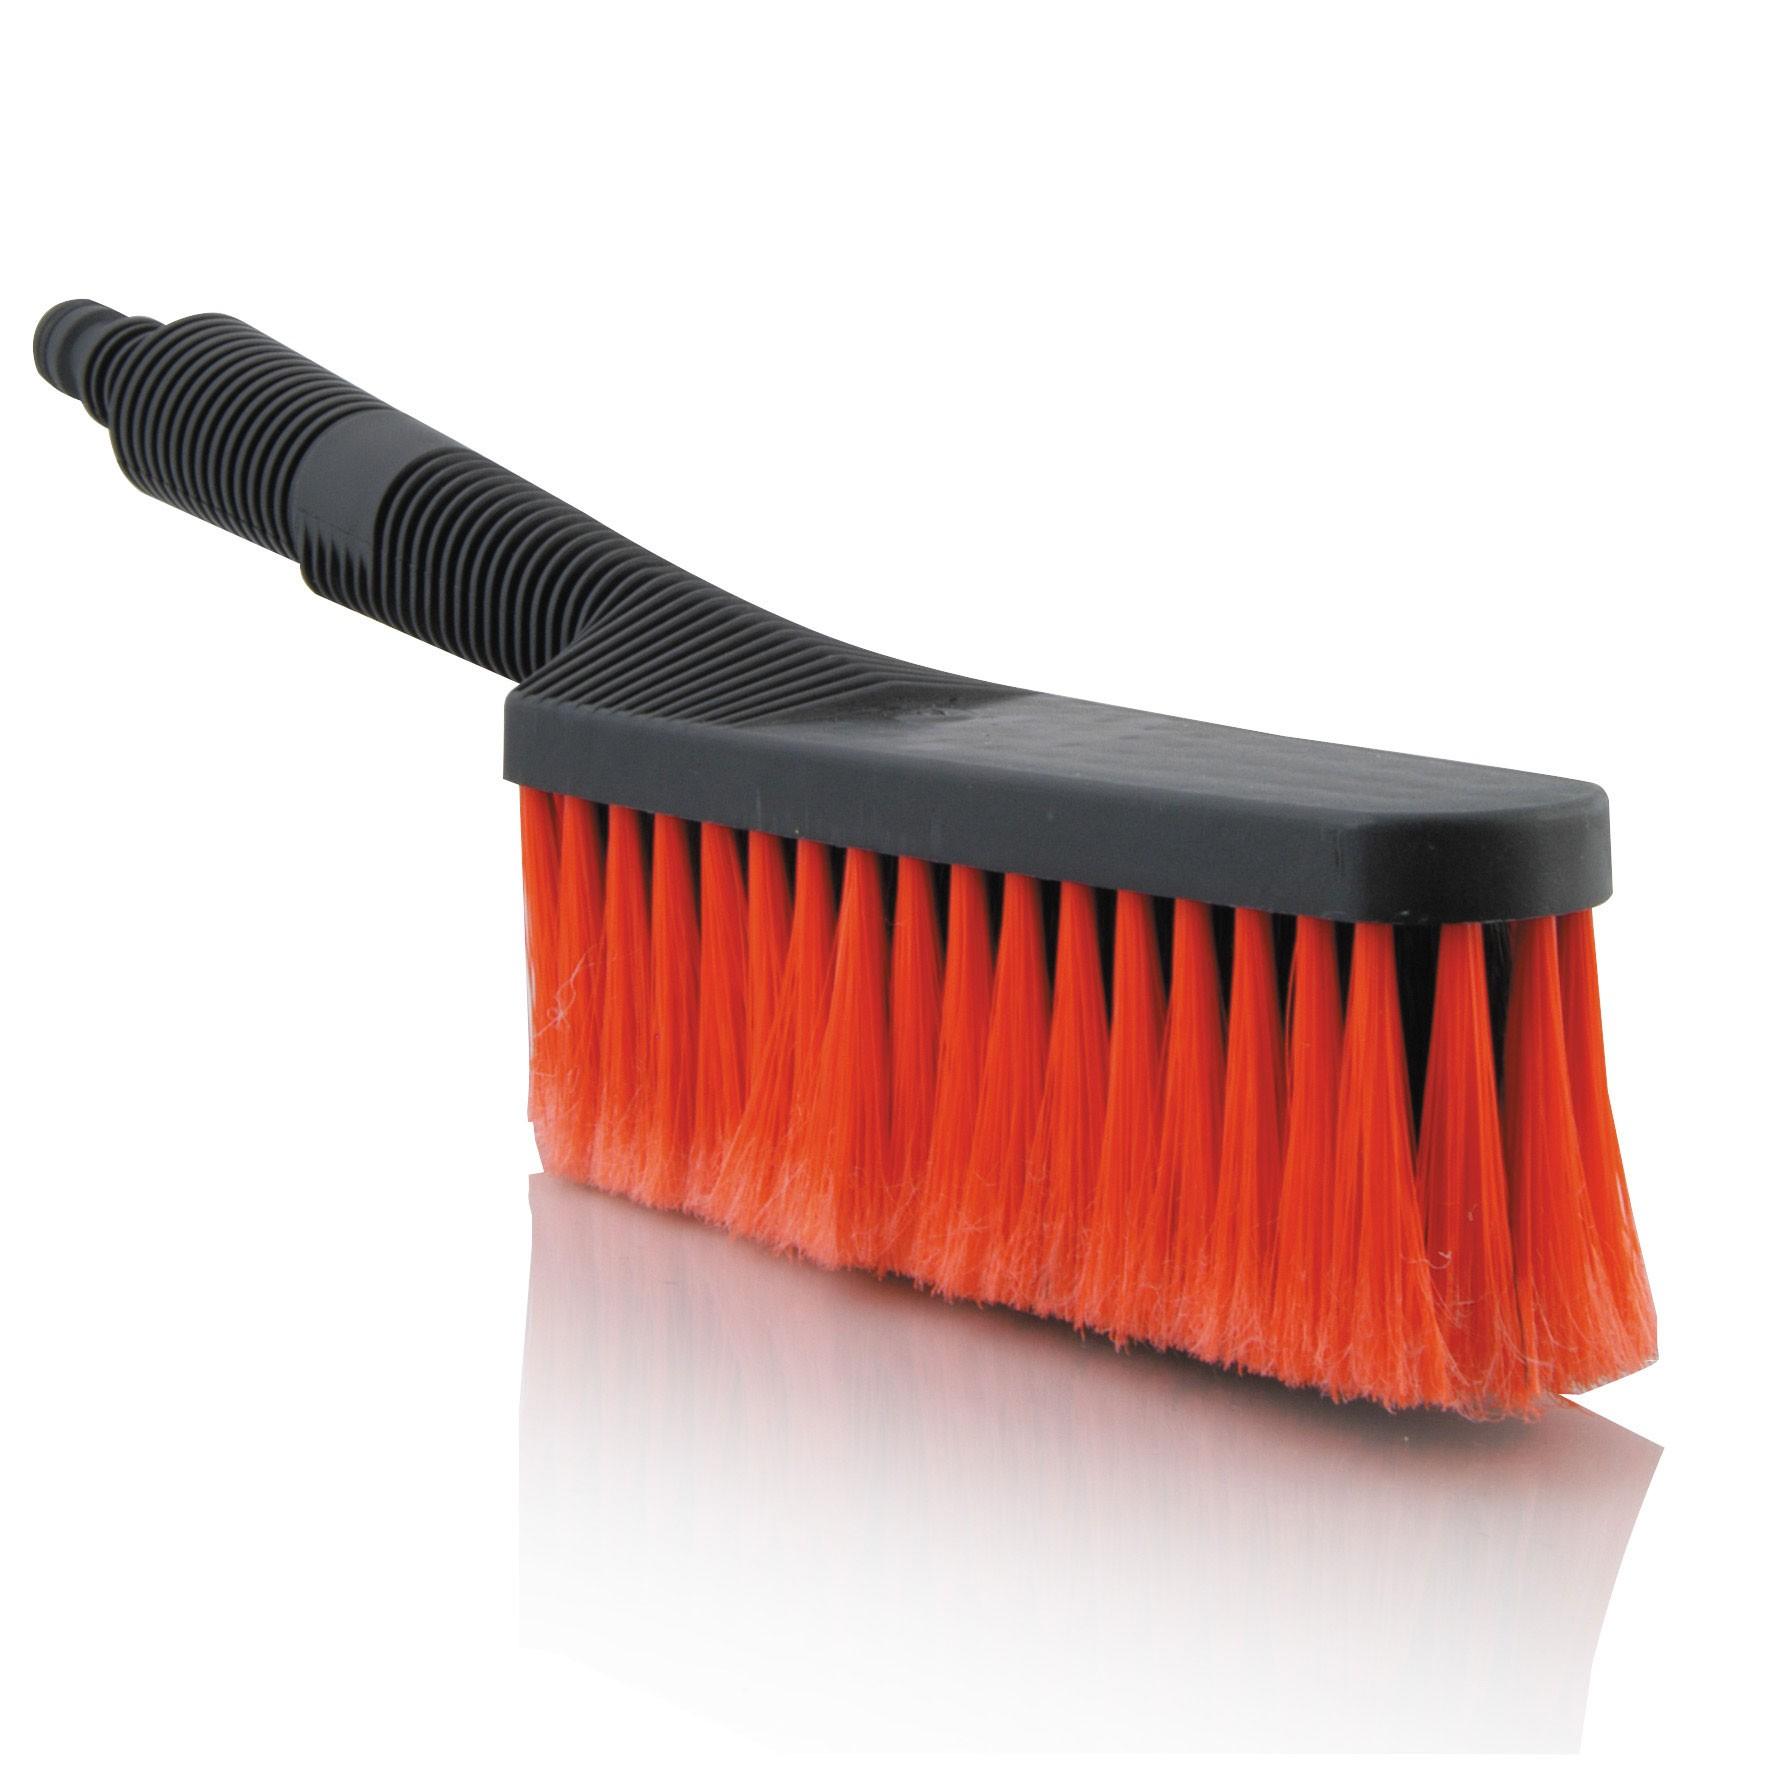 Nigrin Autowaschbürste Modell Standard 1 Stück Bild 1